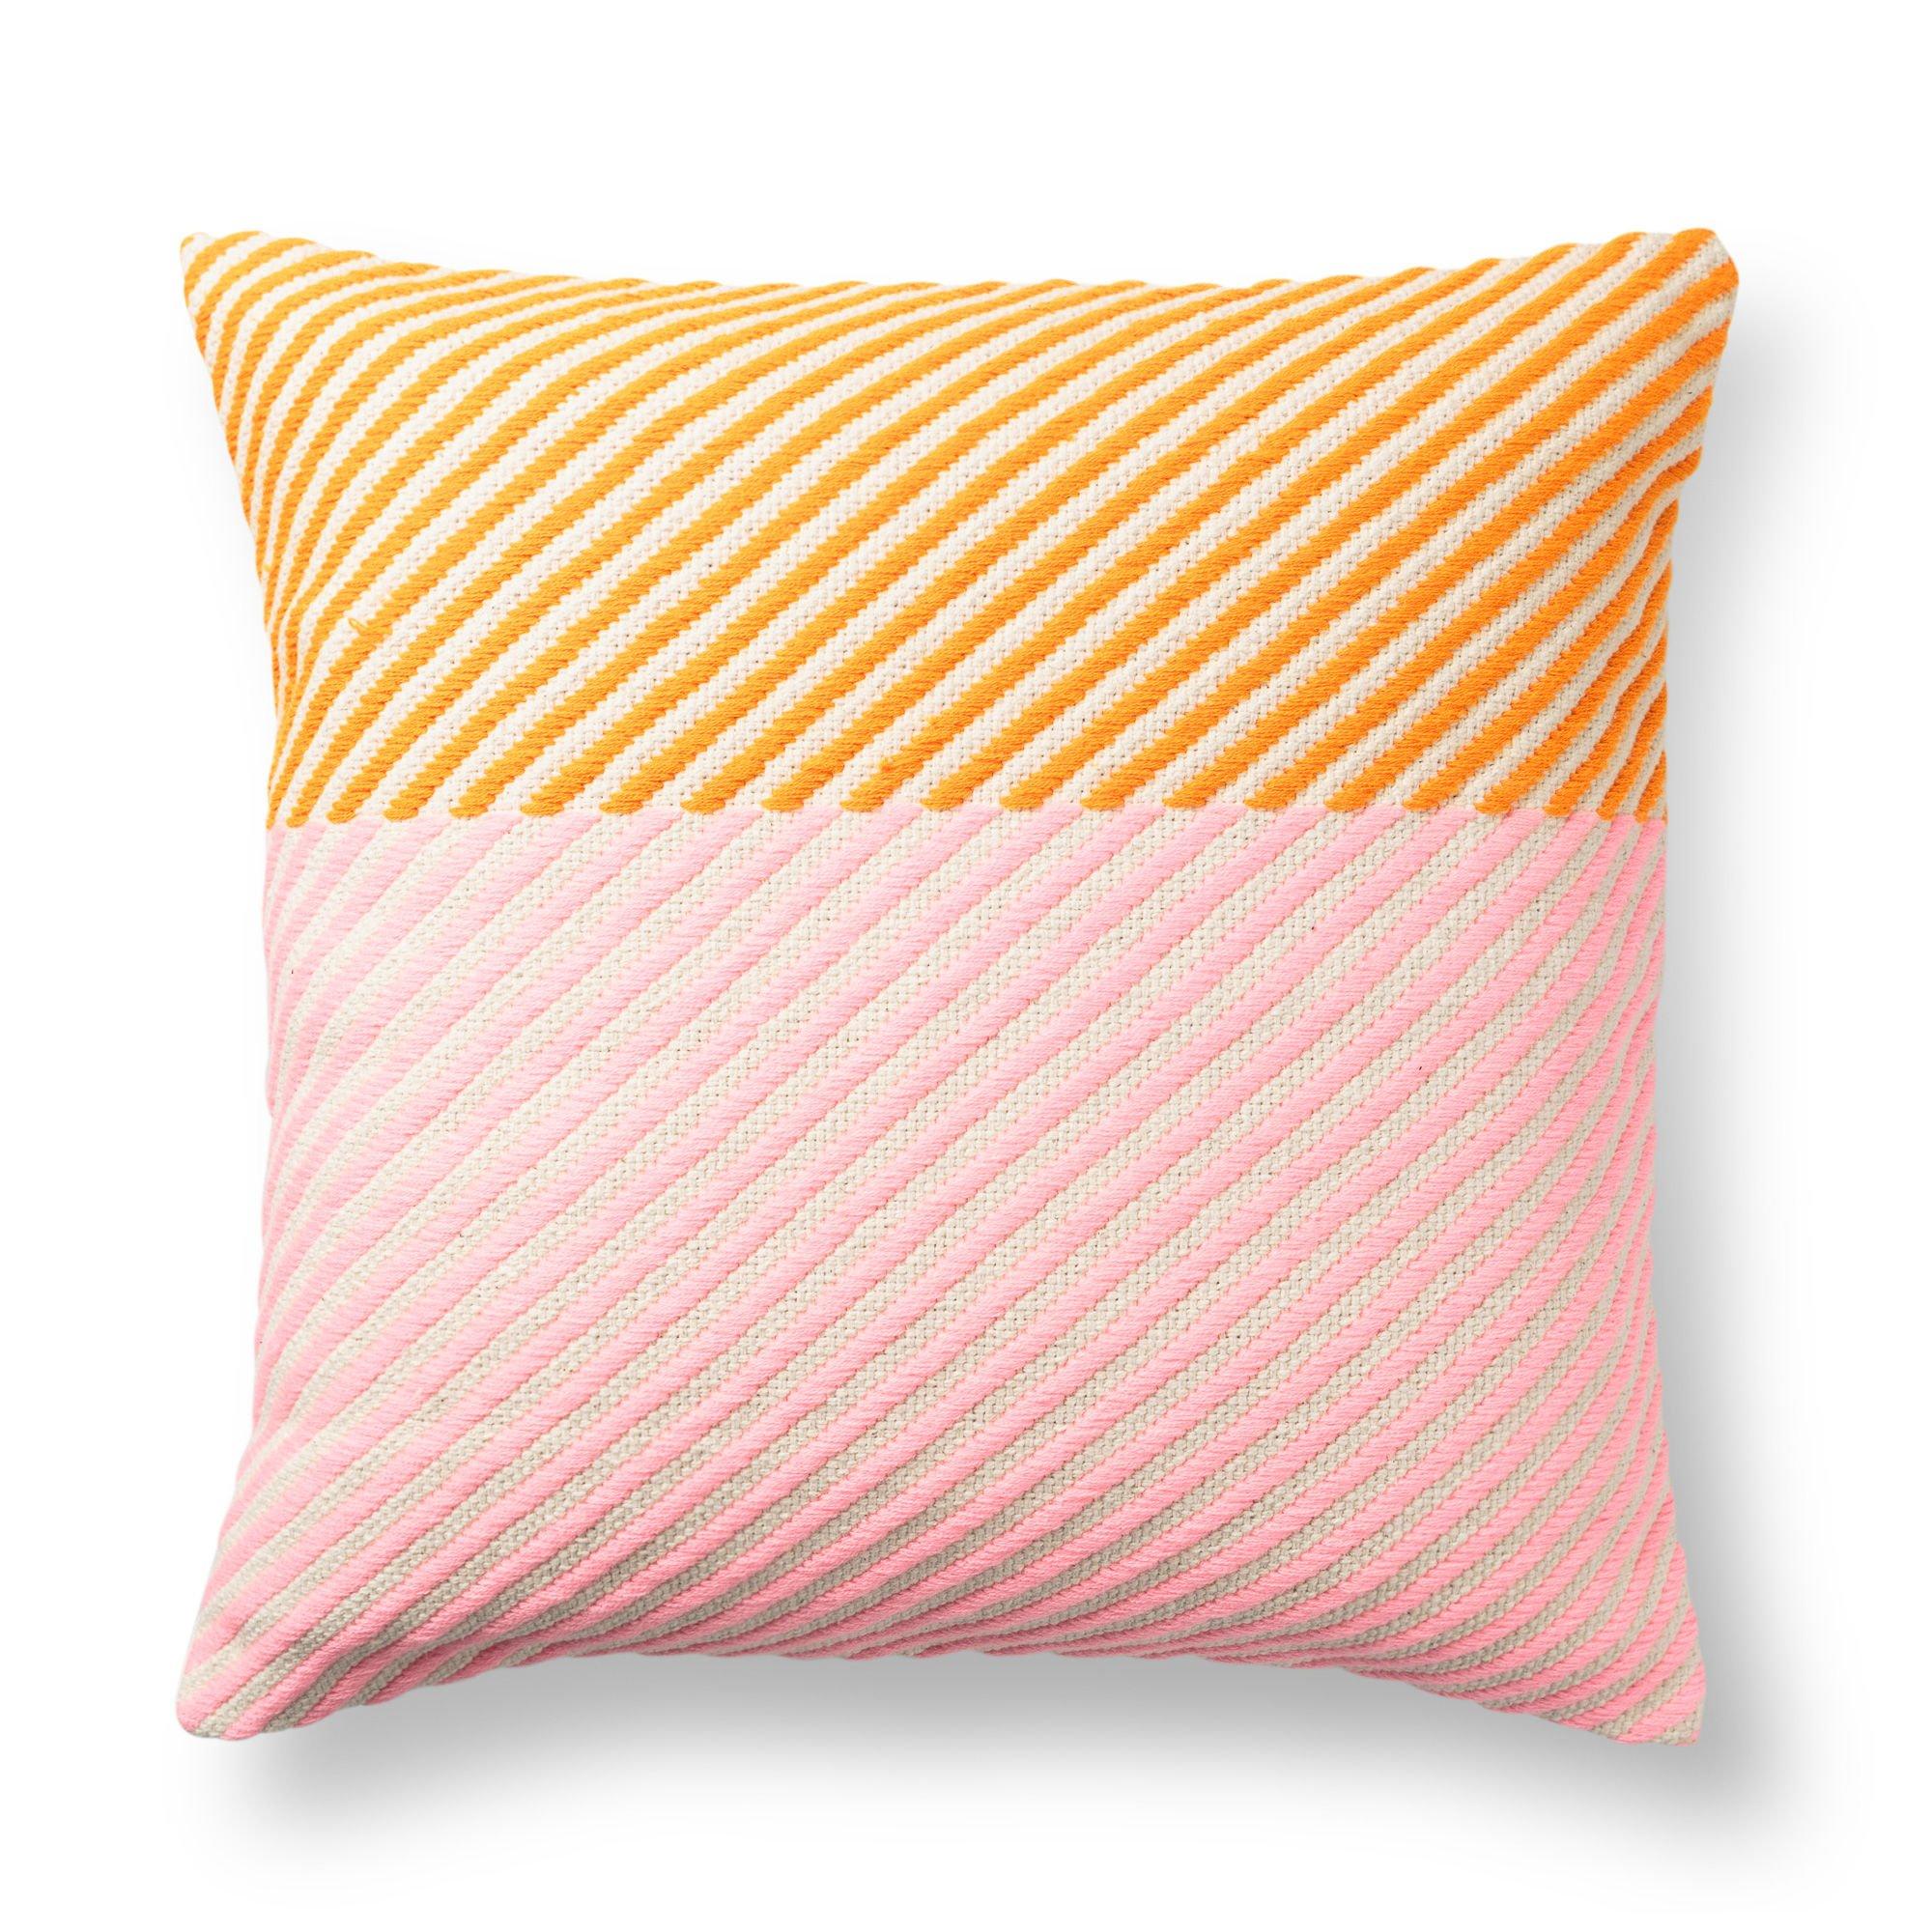 Brand-new Pink Horizontal Block Striped Cushion   Oliver Bonas TF98